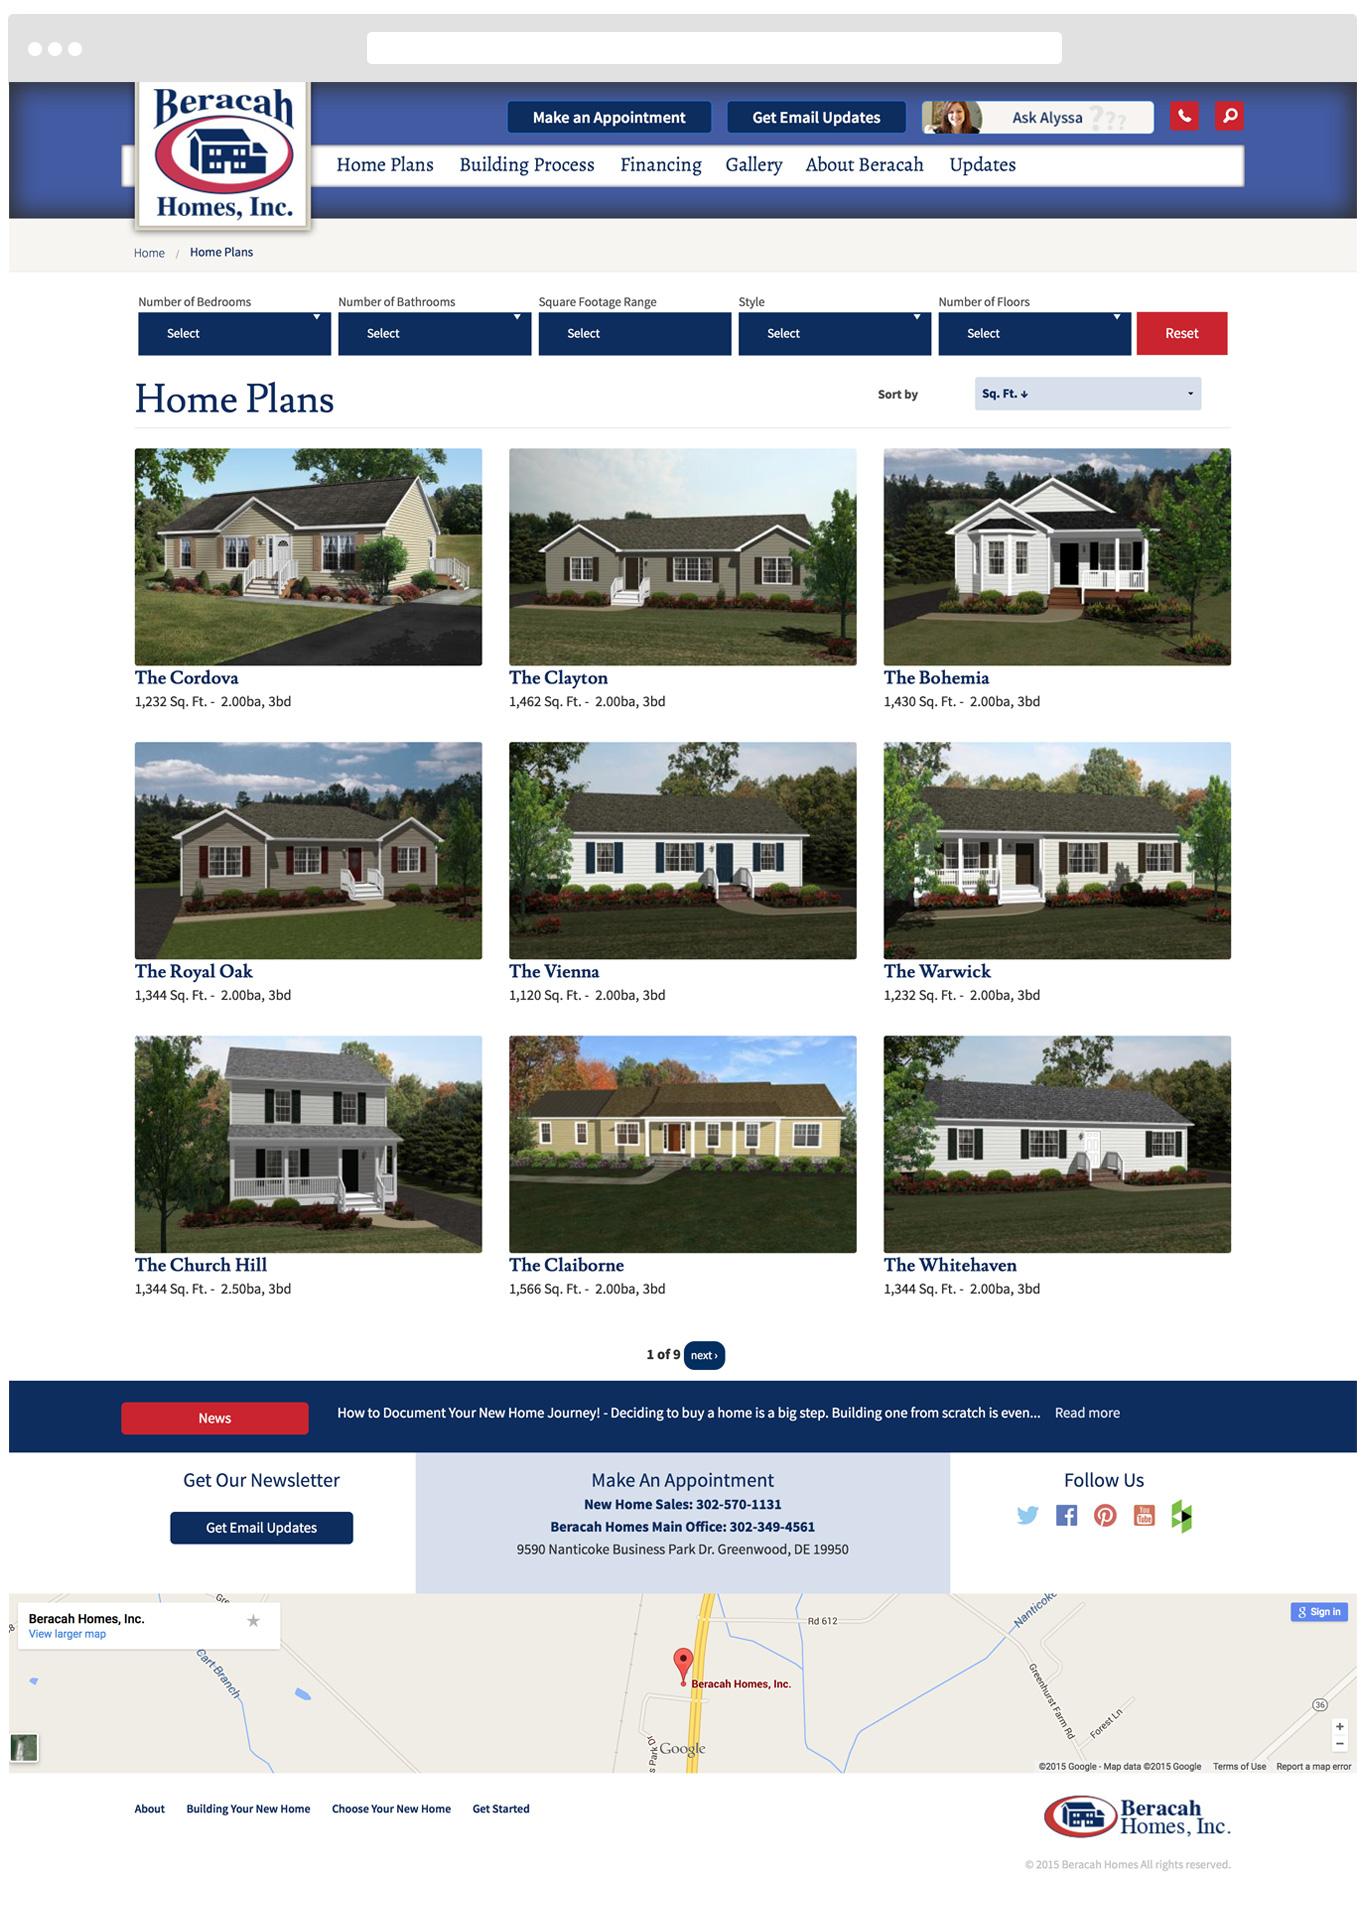 Desktop Home Plan Search Feature